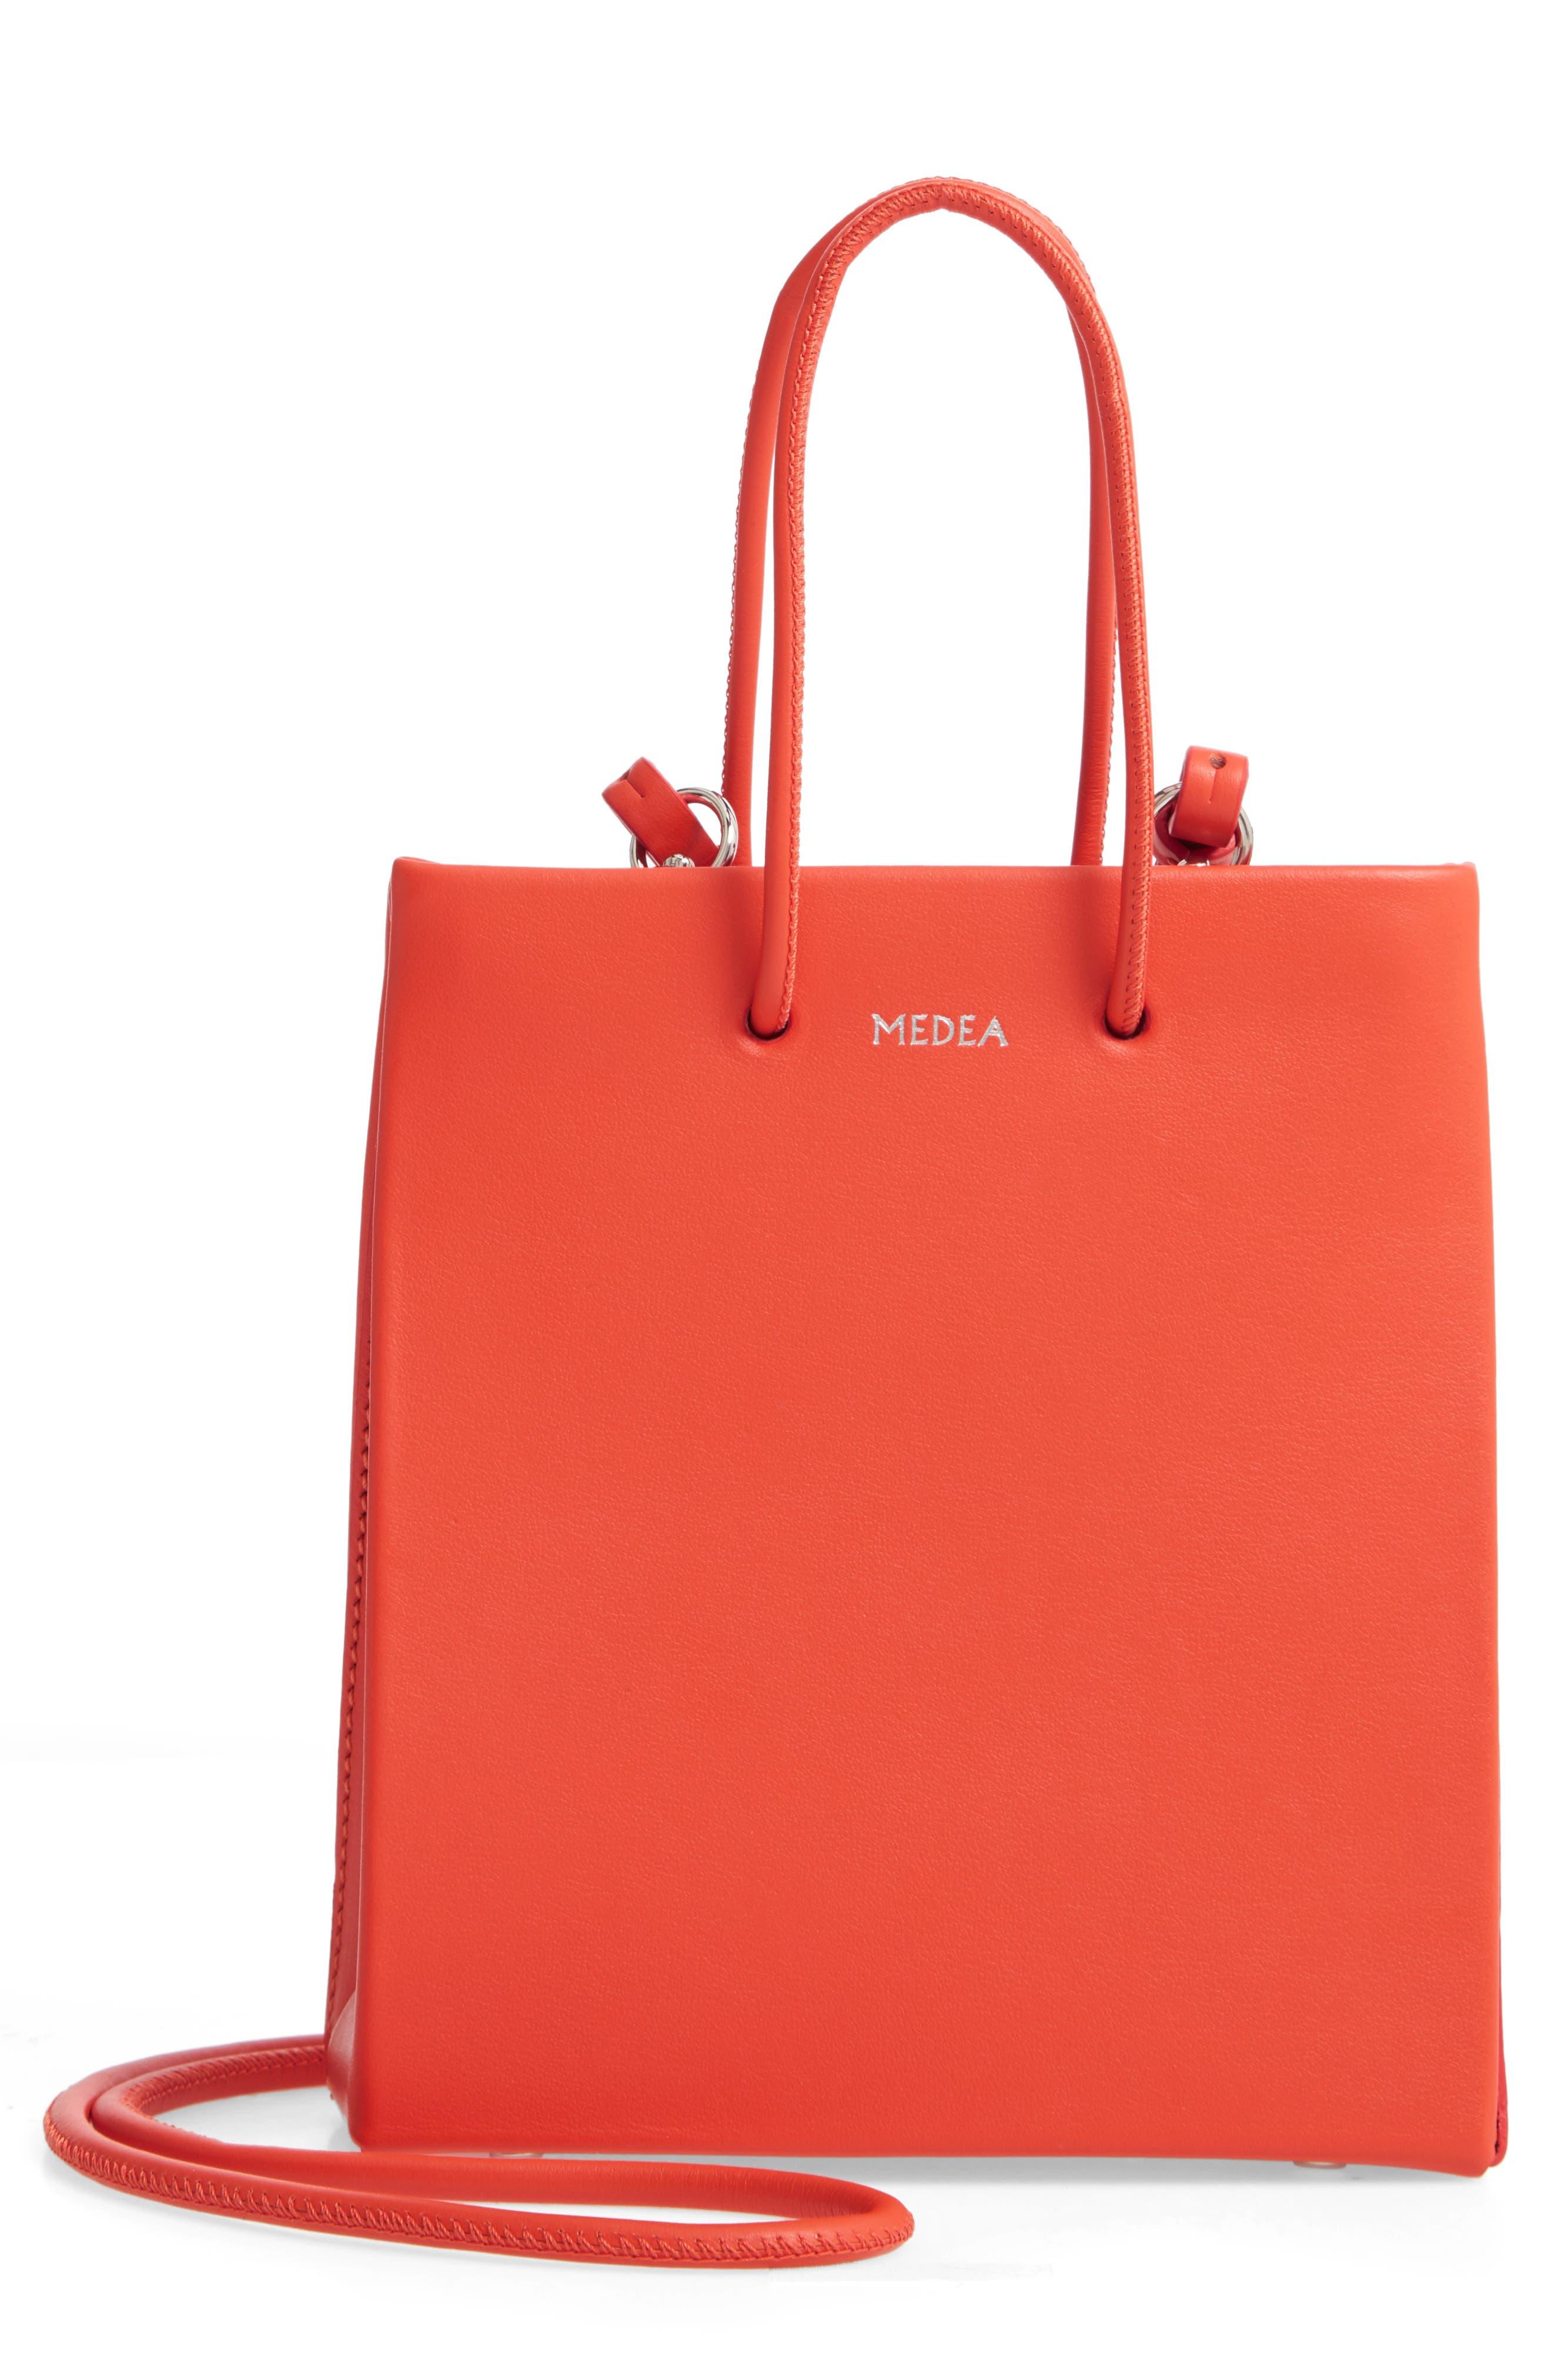 MEDEA, Prima Short Calfskin Leather Bag, Main thumbnail 1, color, ORANGE